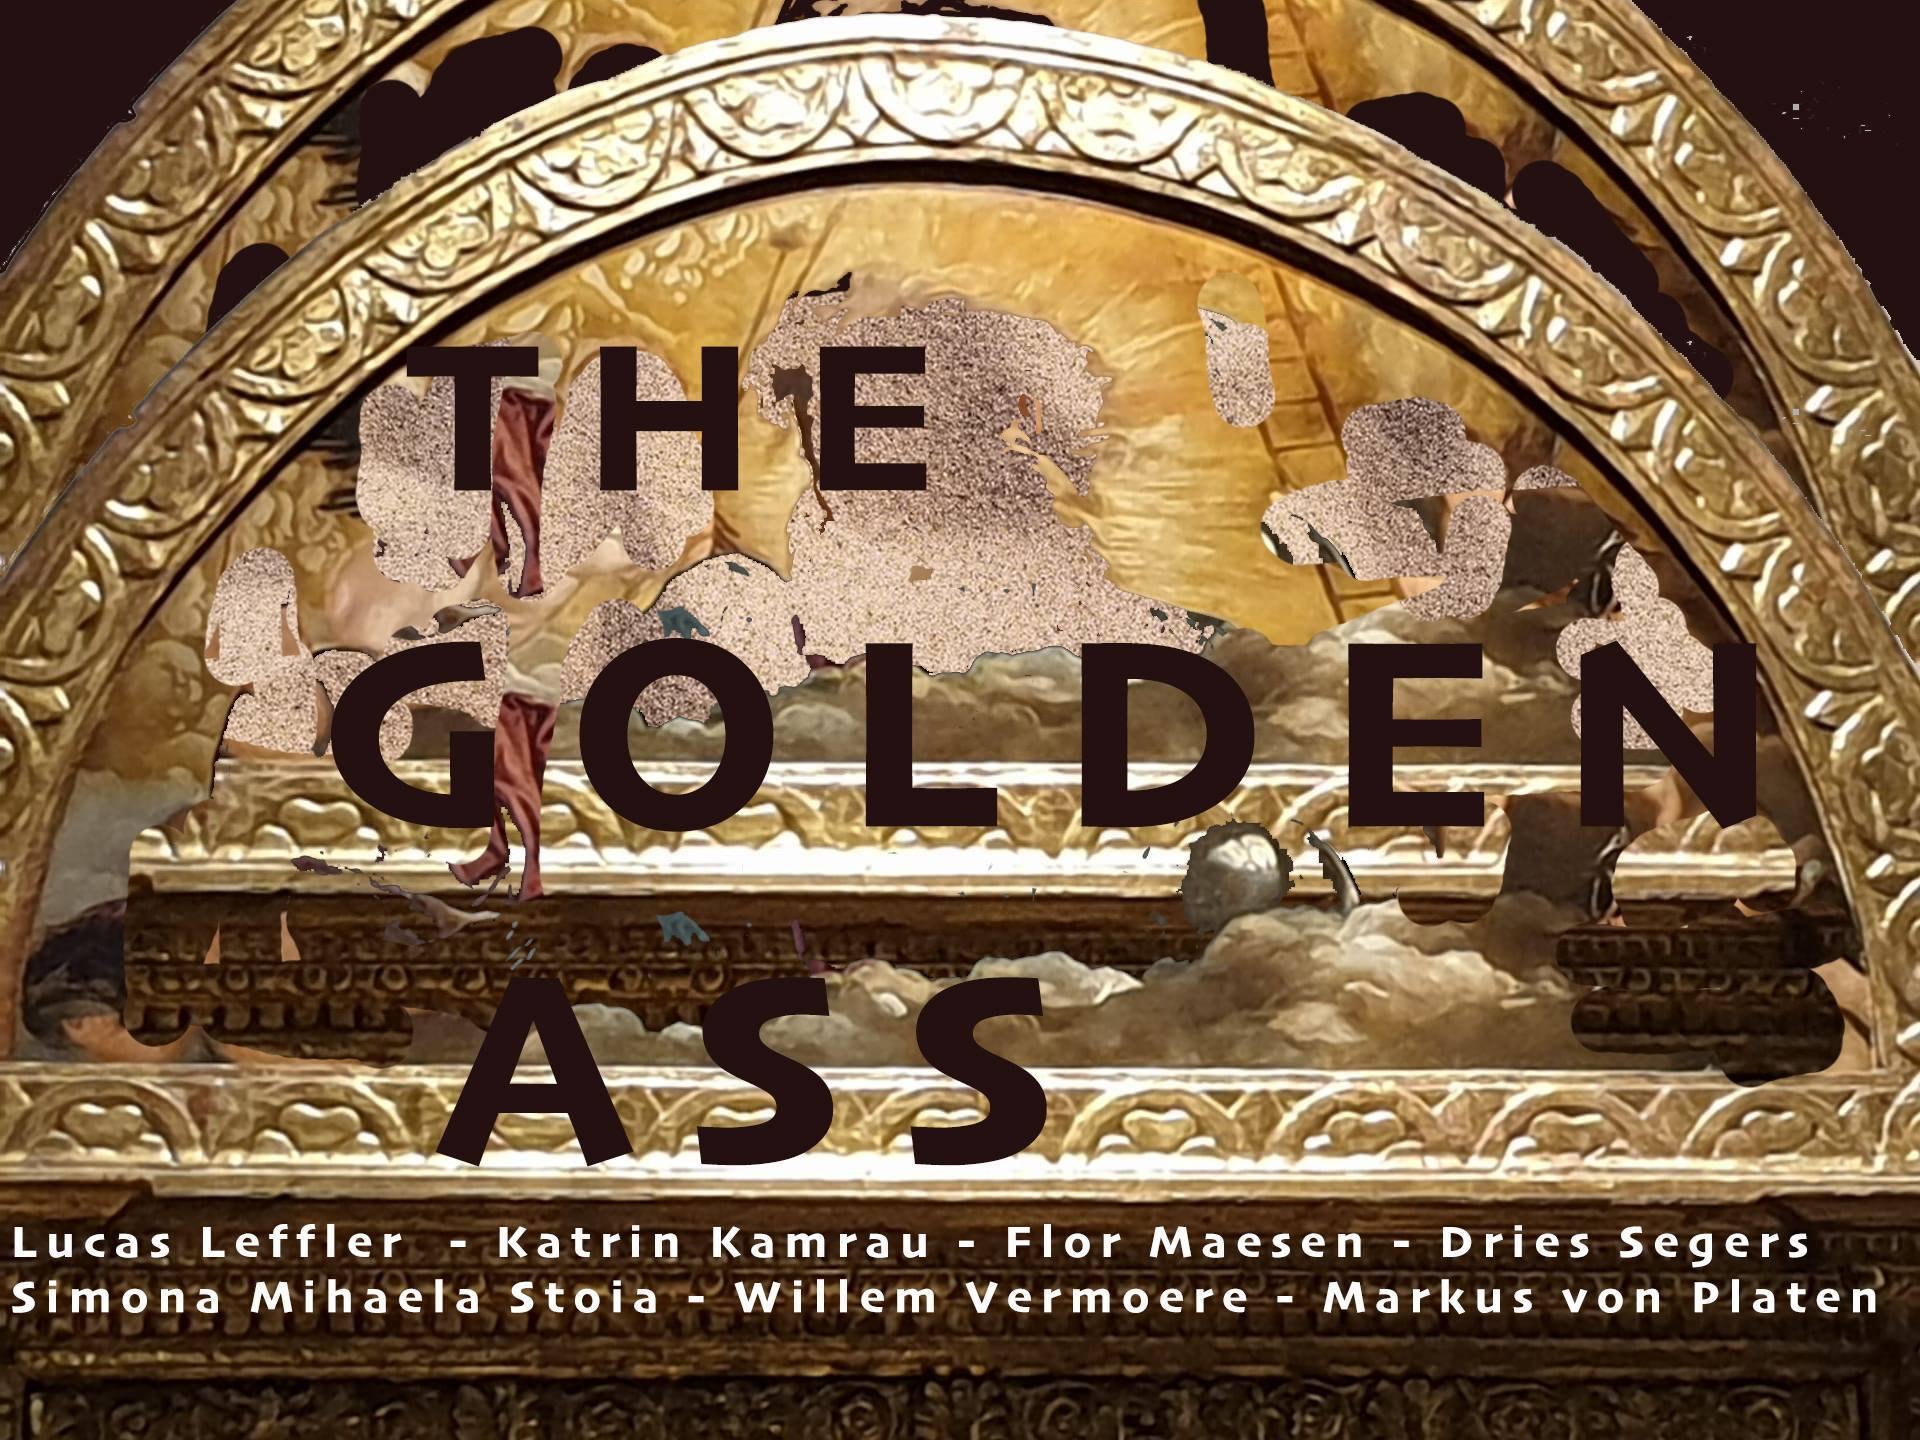 The Golden Ass in In De Ruimte, Ghent